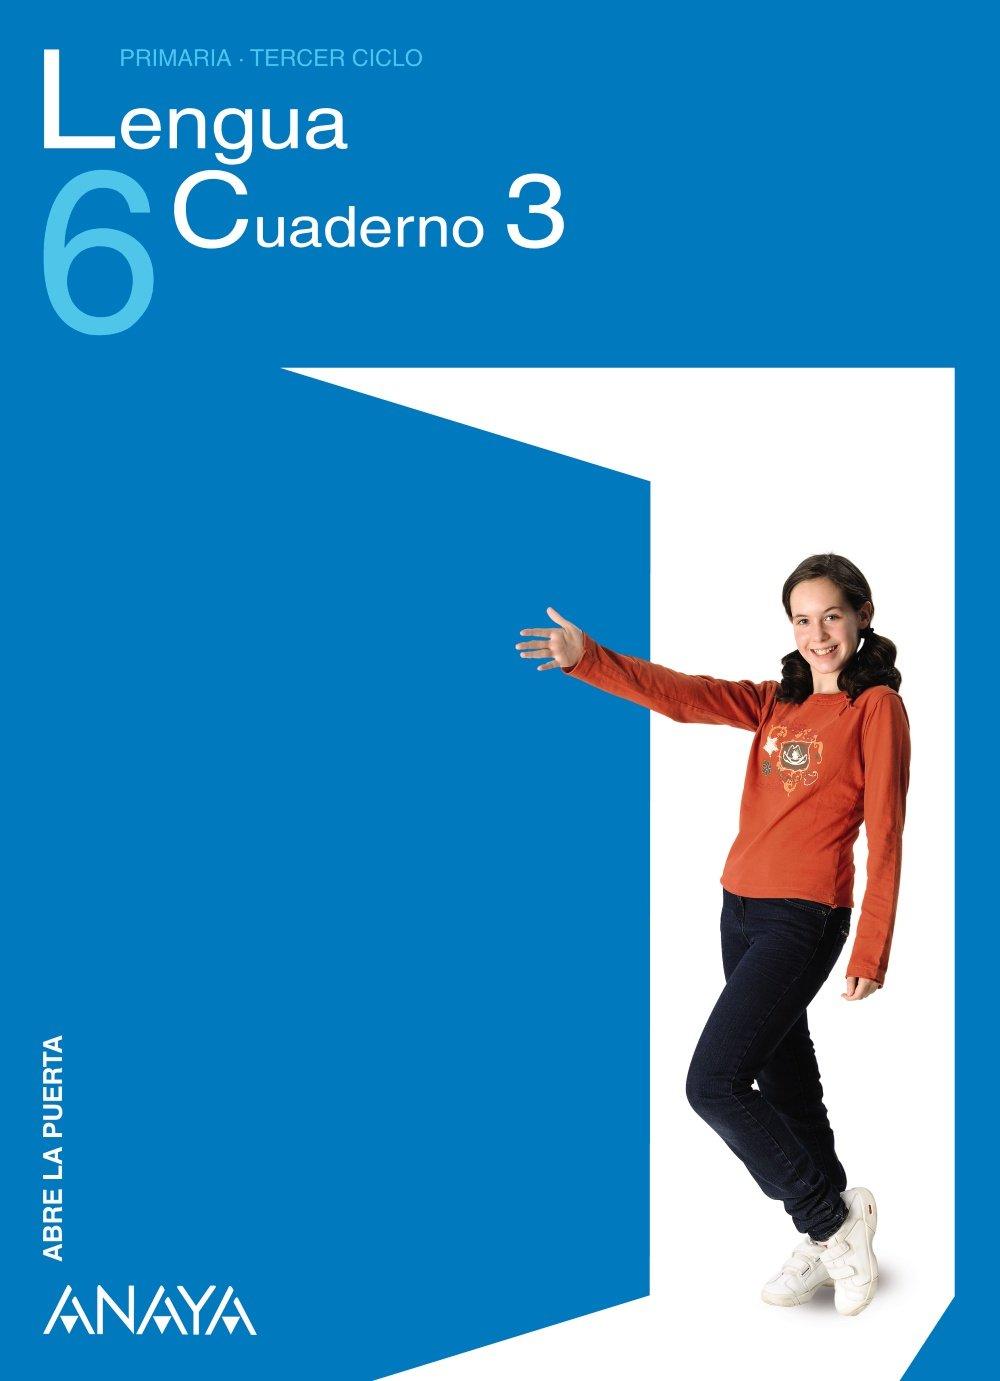 Lengua 6. Cuaderno 3. (Spanish) Stationery – June 11, 2009